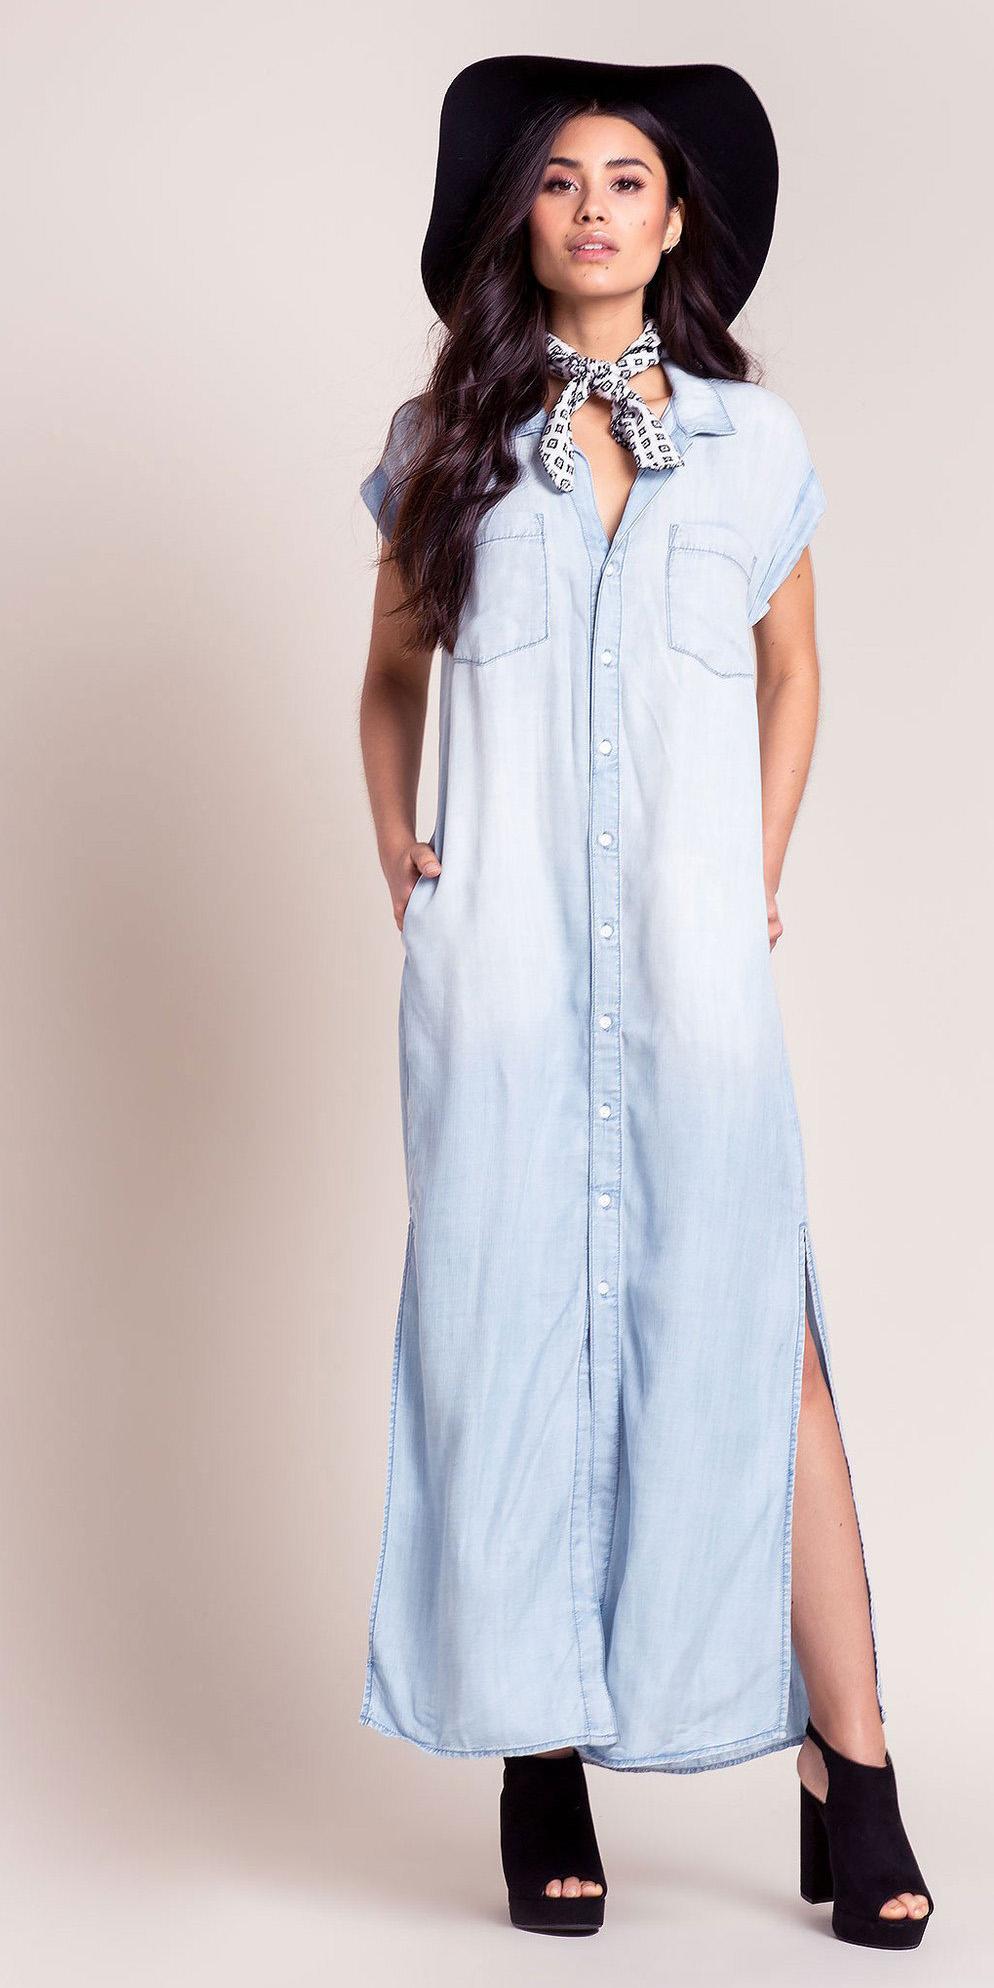 blue-light-dress-shirt-maxi-hat-white-scarf-neck-bandana-black-shoe-sandalh-spring-summer-brun-lunch.jpg